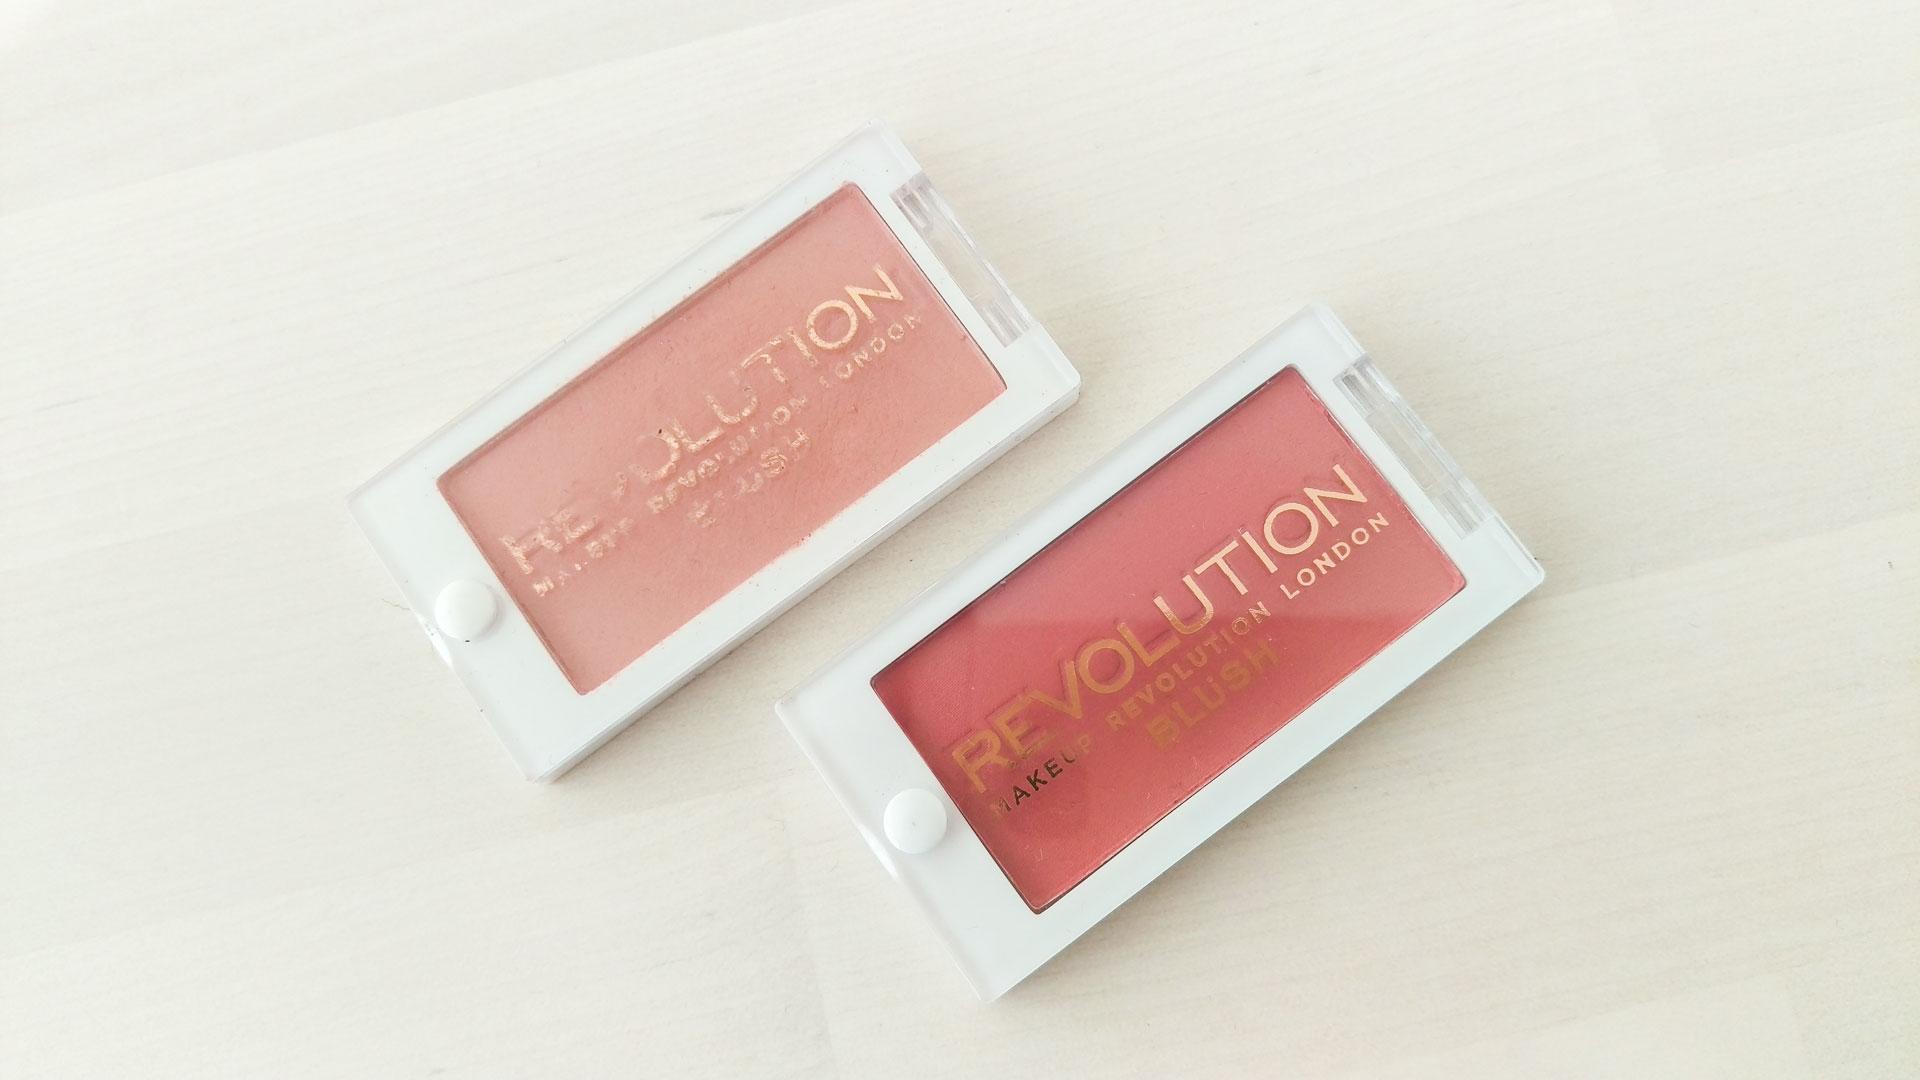 Makeup Revolution Blush darieflavour